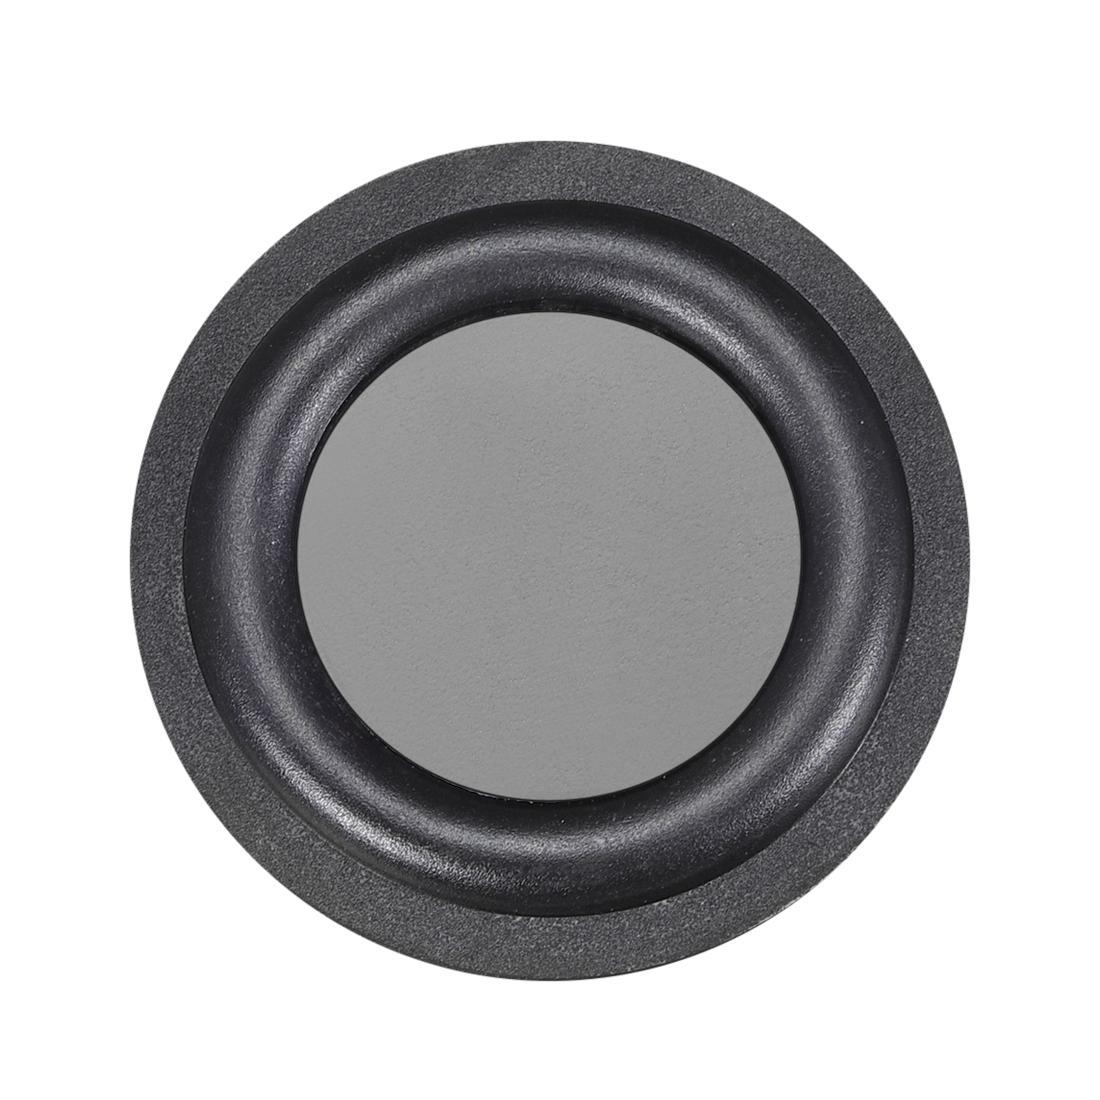 "1.8"" 45mm Bass Speaker Passive Radiator Rubber Vibration Plate Repair"